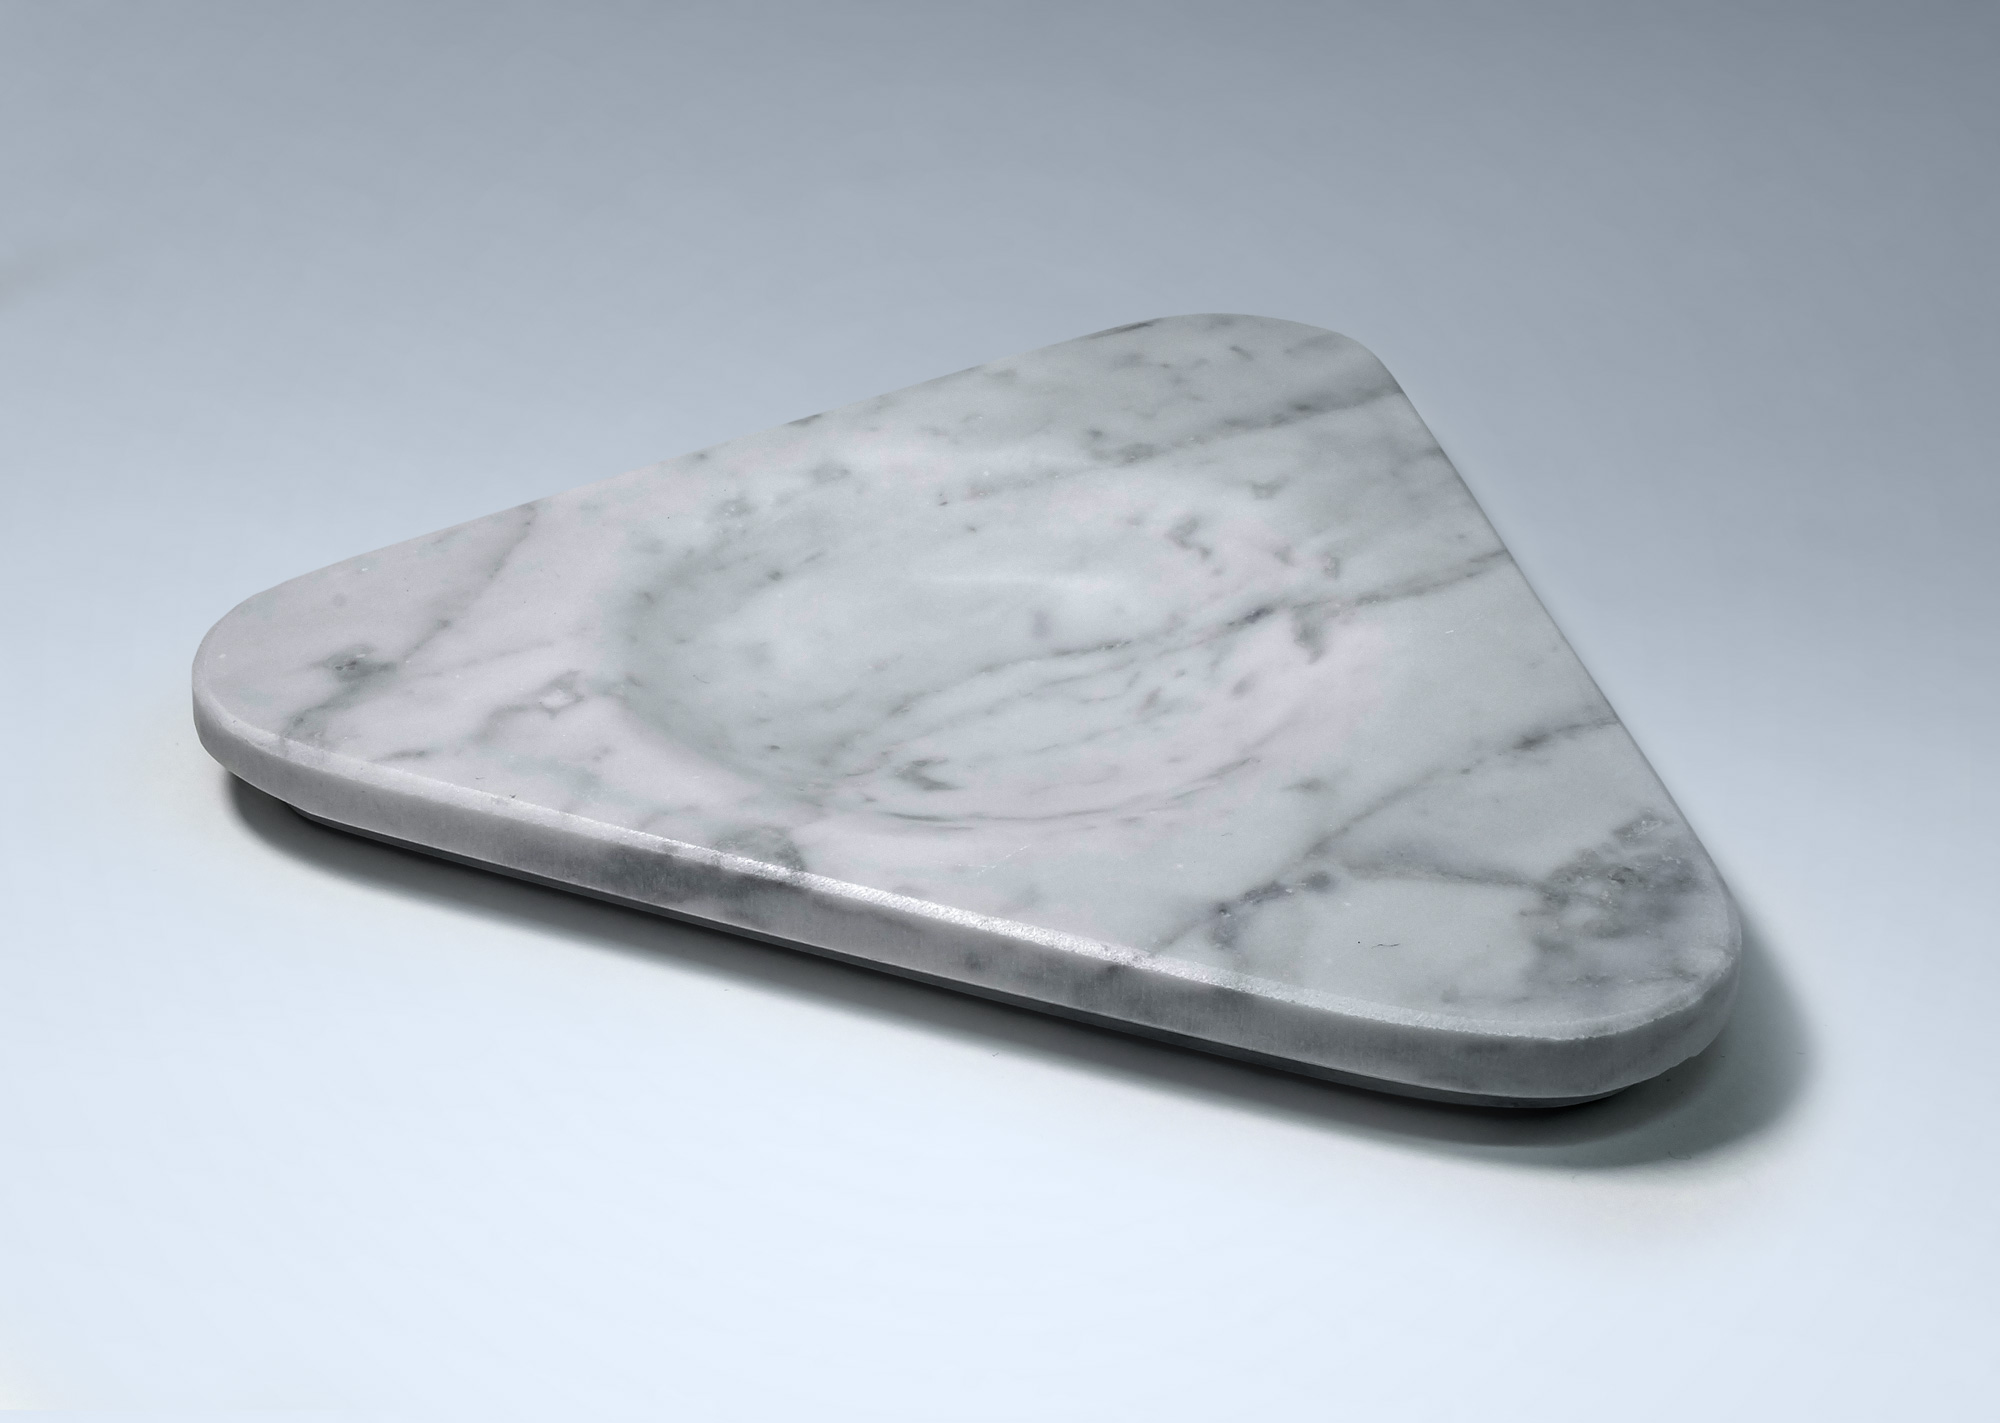 Plato triangular de mármol